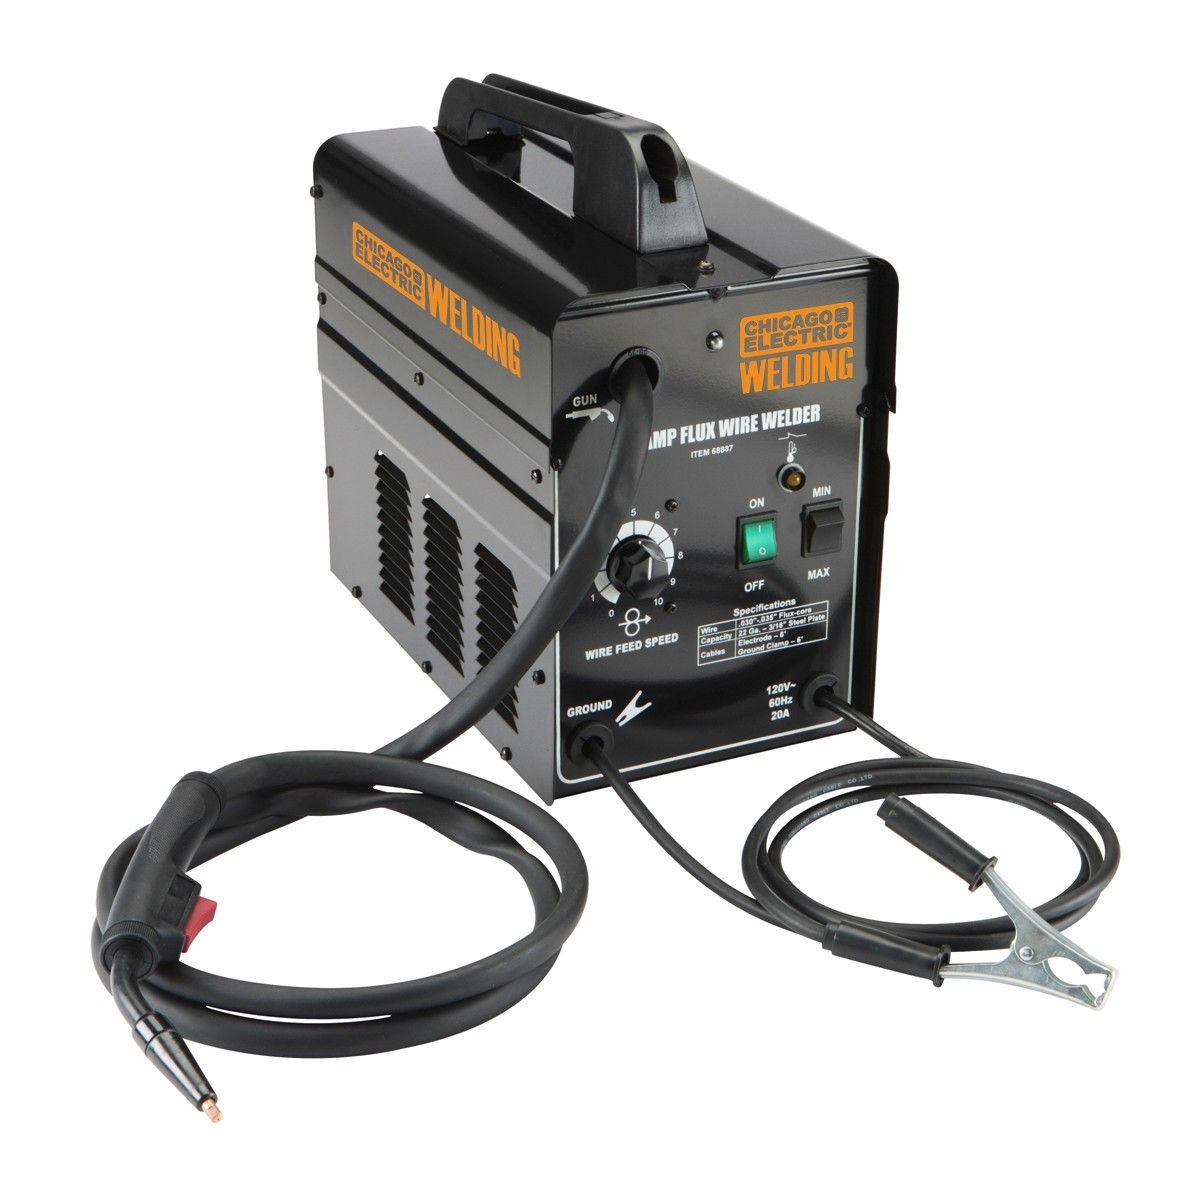 hight resolution of  89 99 chicago electric welding 68887 90 amp flux wire welder black friday blackfriday harborfreight